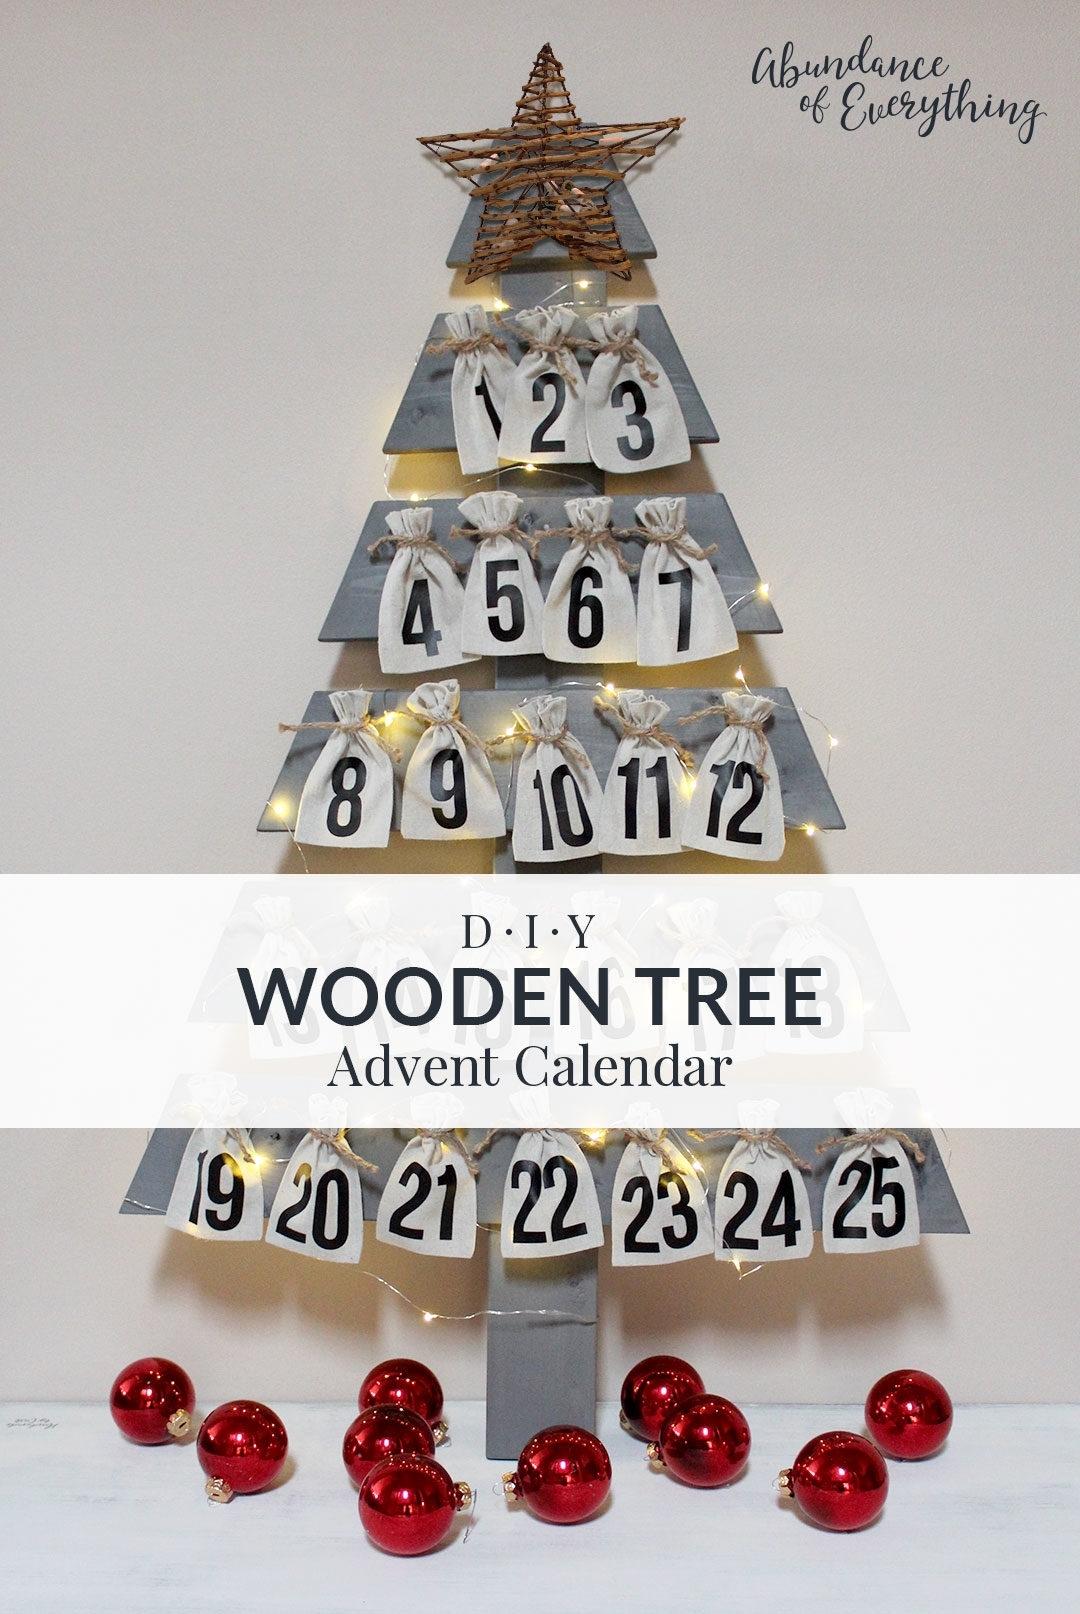 Diy Wooden Tree Advent Calendar - Abundance Of Everything in Create An Advent Calender Wooden